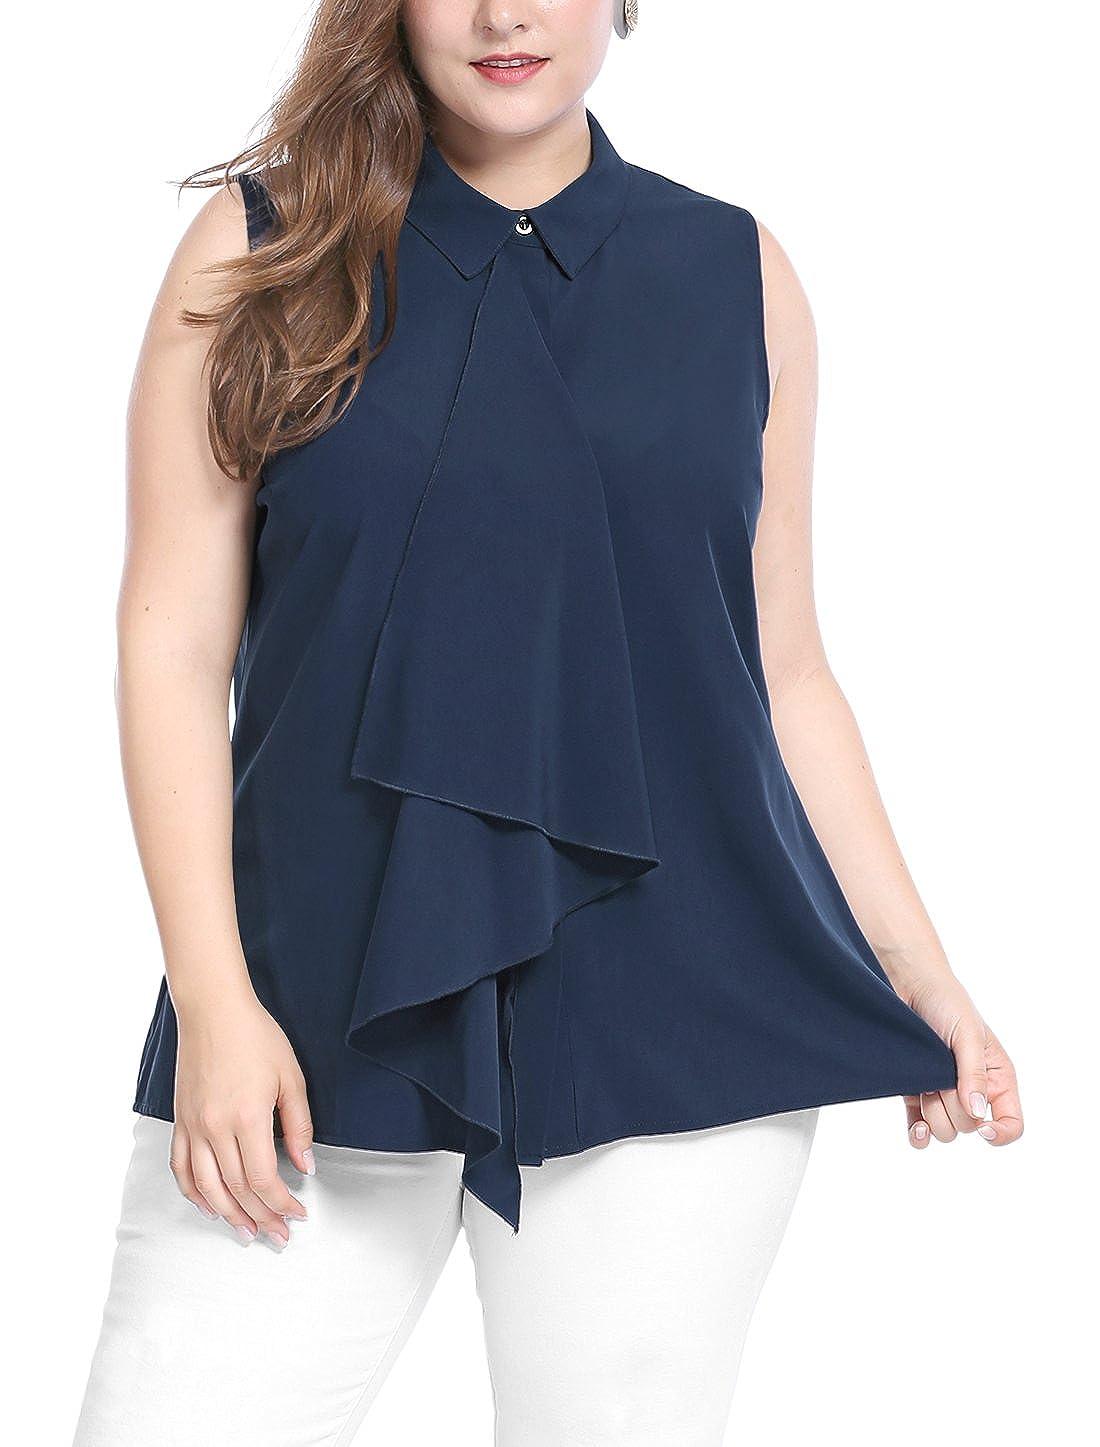 Allegra K Womens Plus Size Hidden Placket Ruffle Fashion Sleeveless Shirt